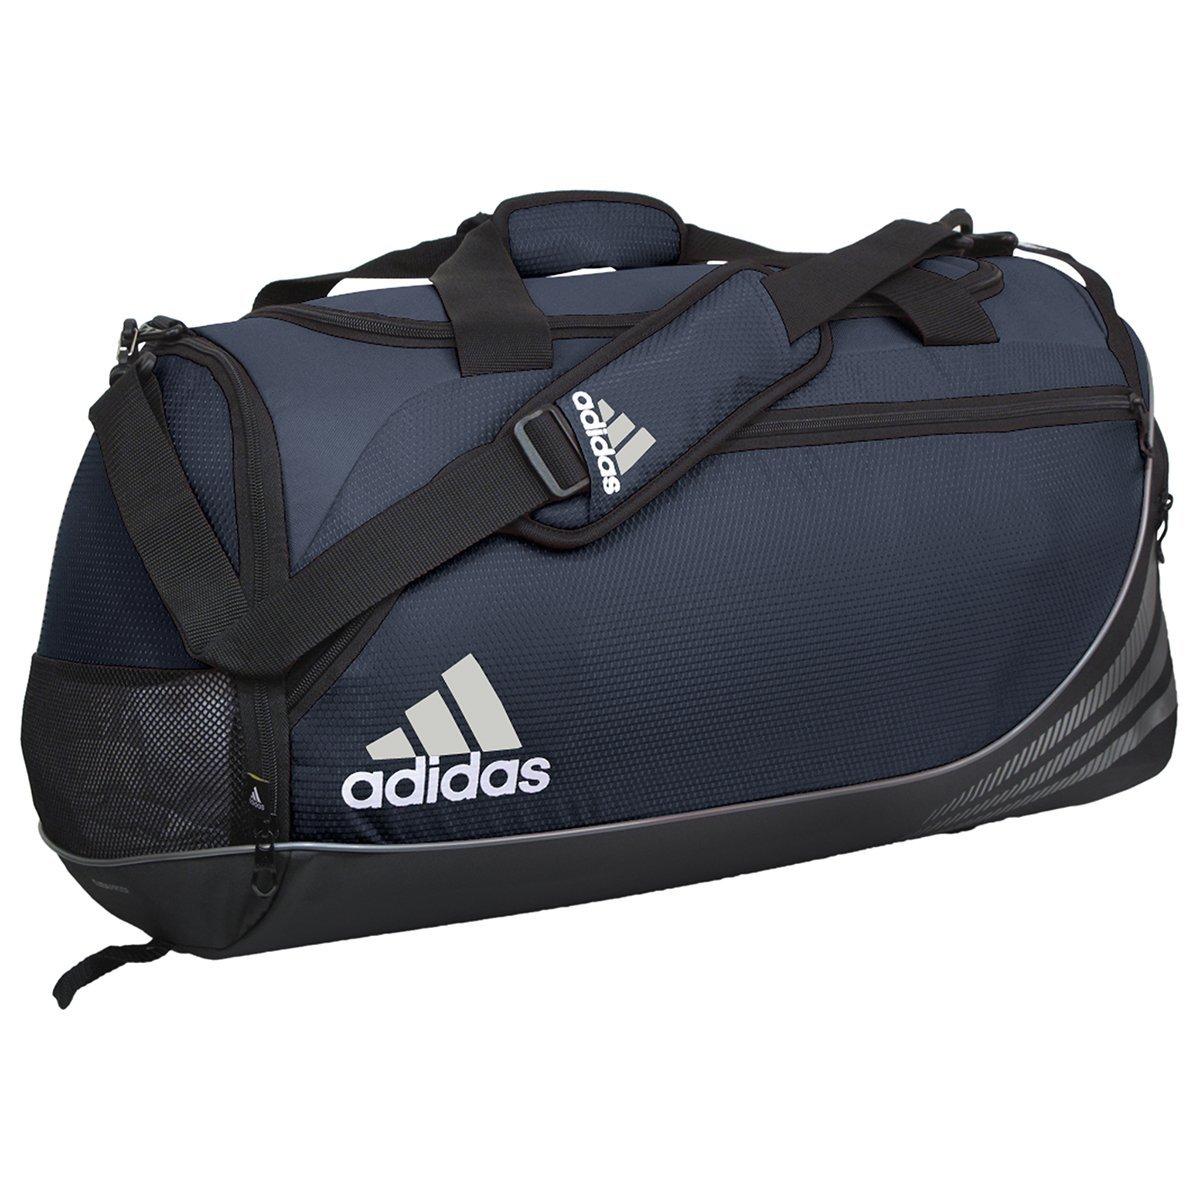 Adidas Team Speed Gym Bag